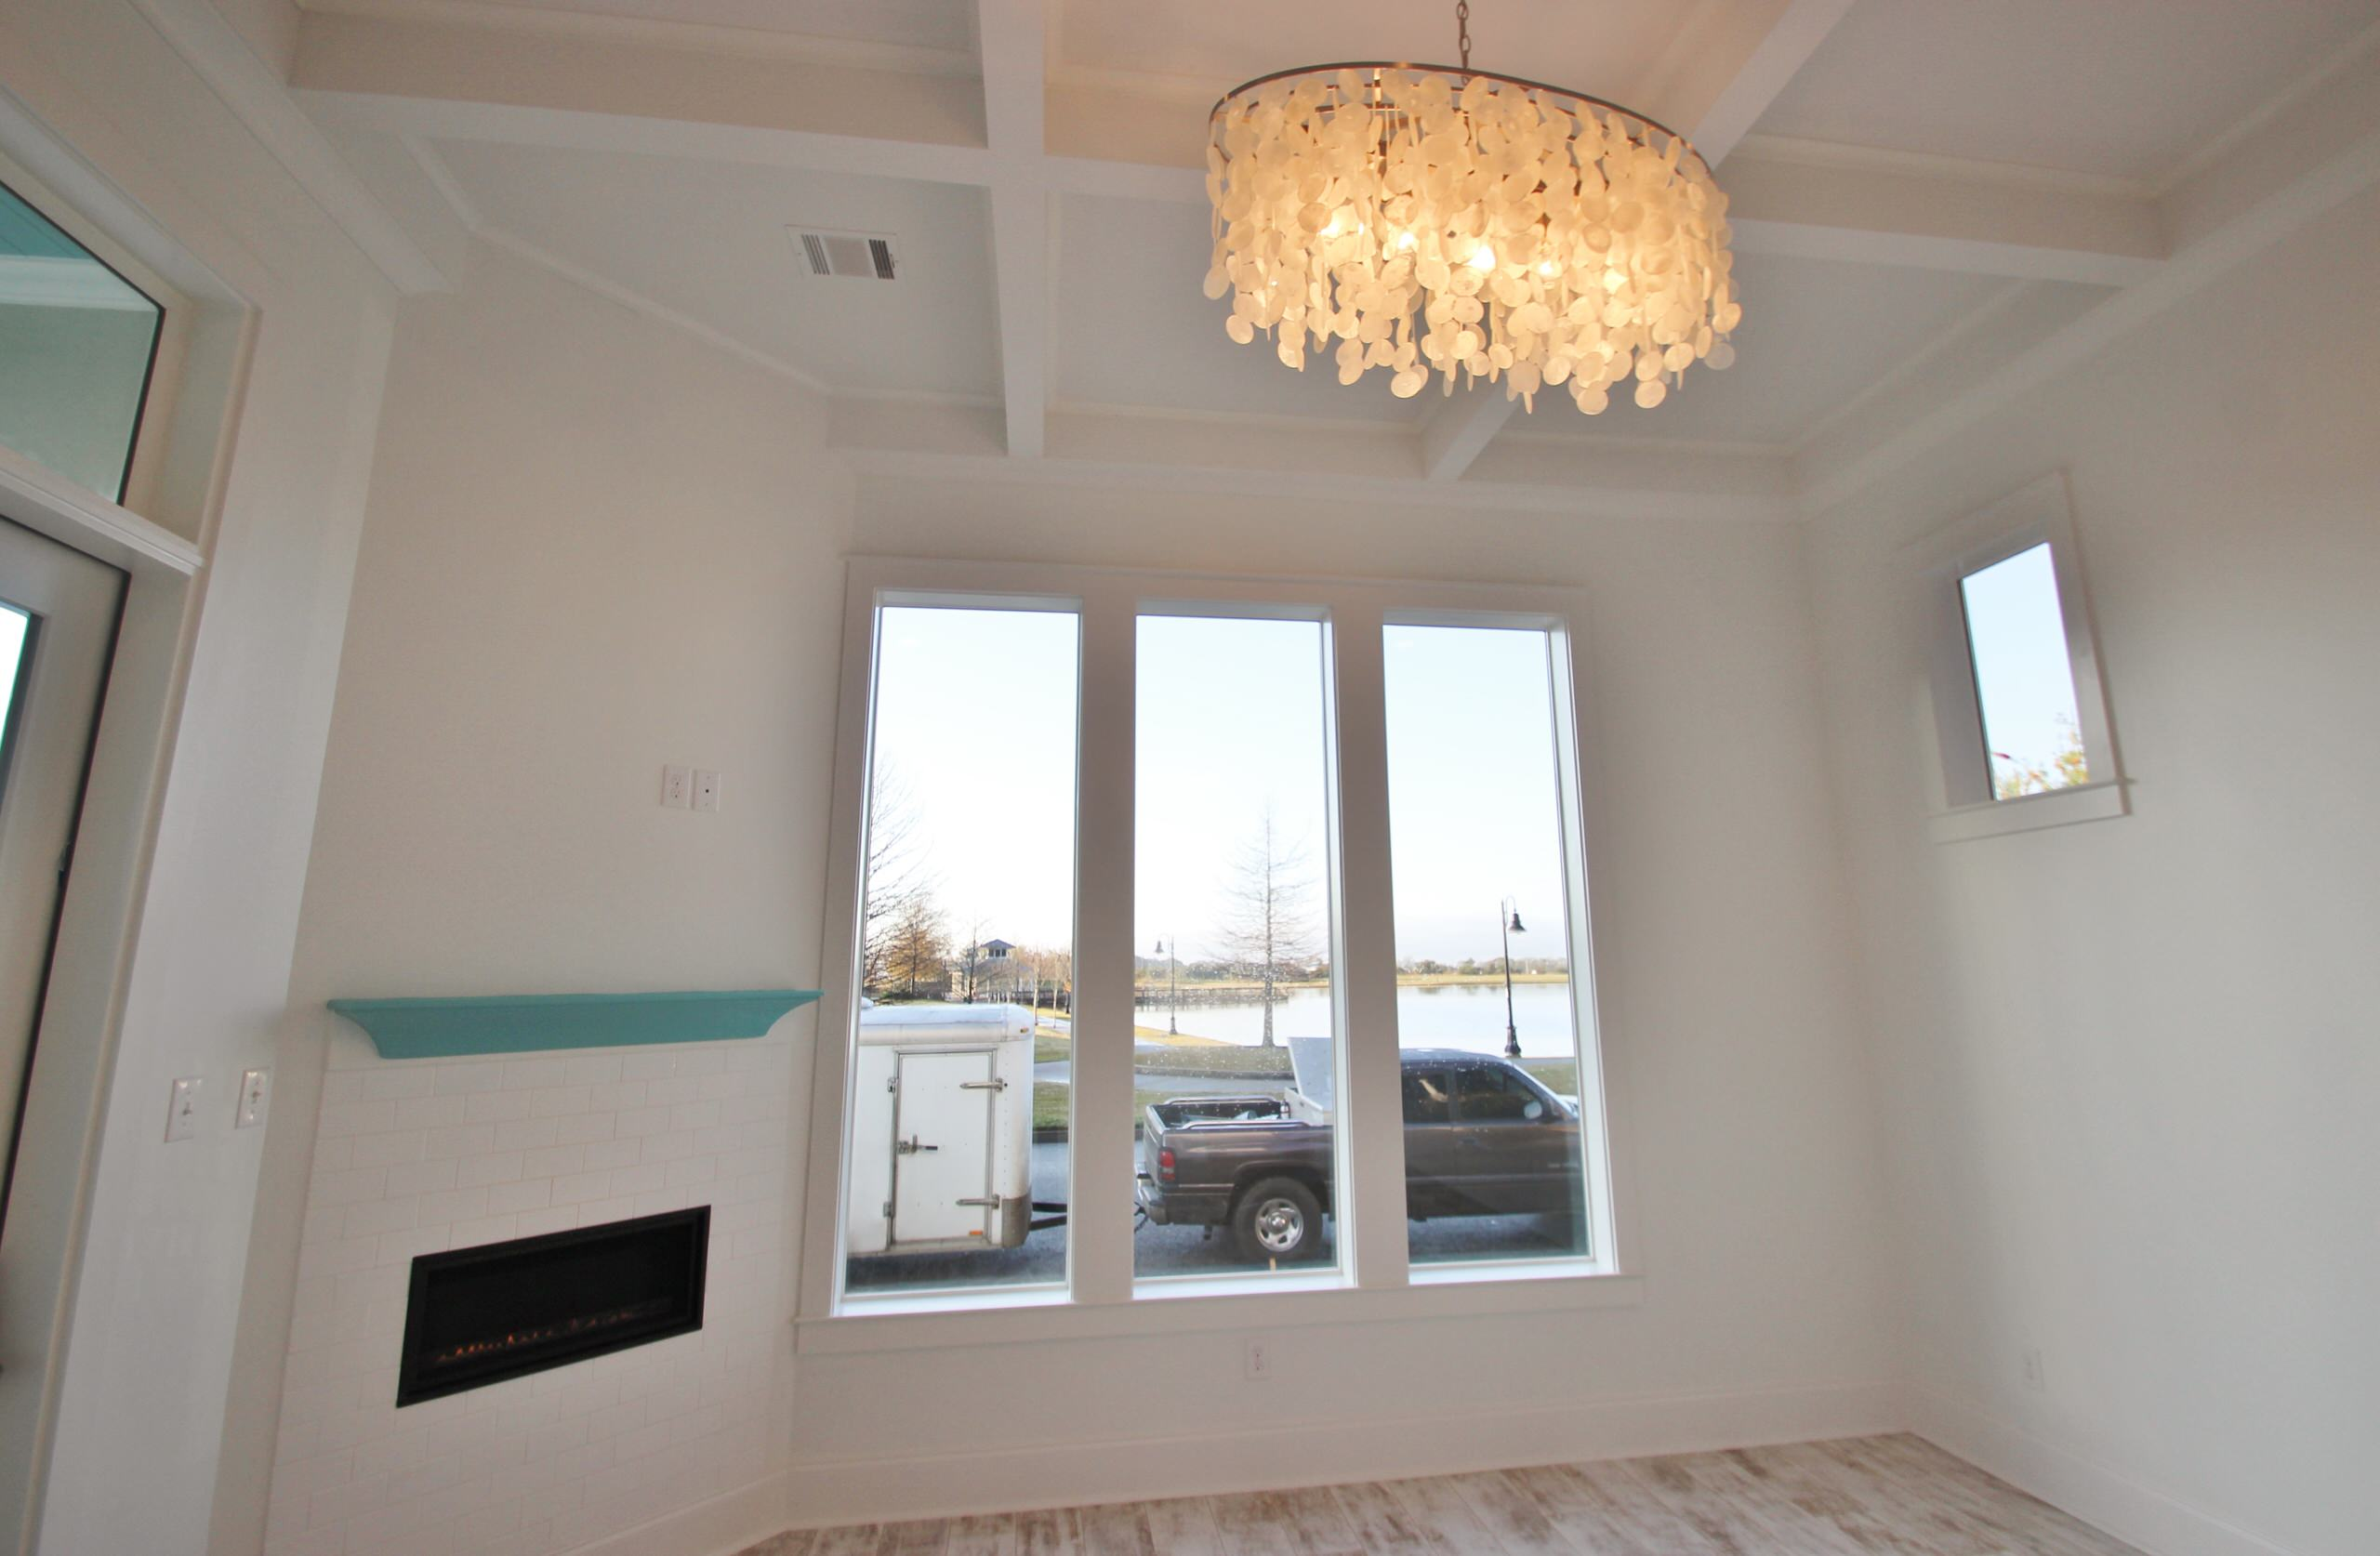 Gallery-Mann Residence